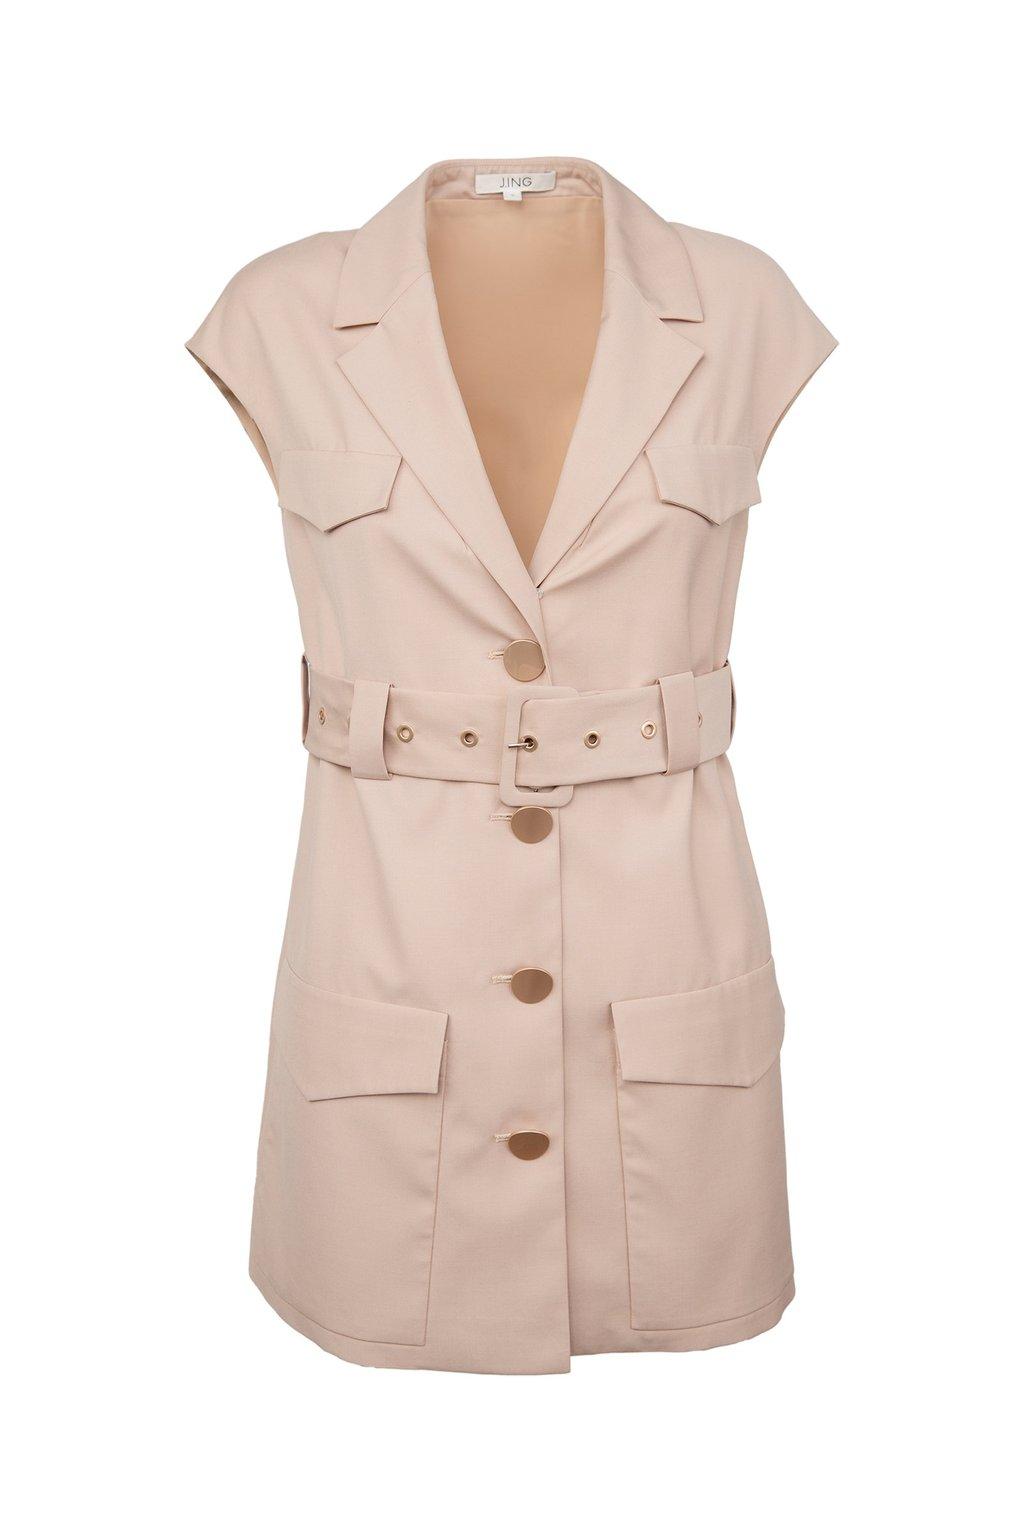 Commander Dress by J.ING women's clothing